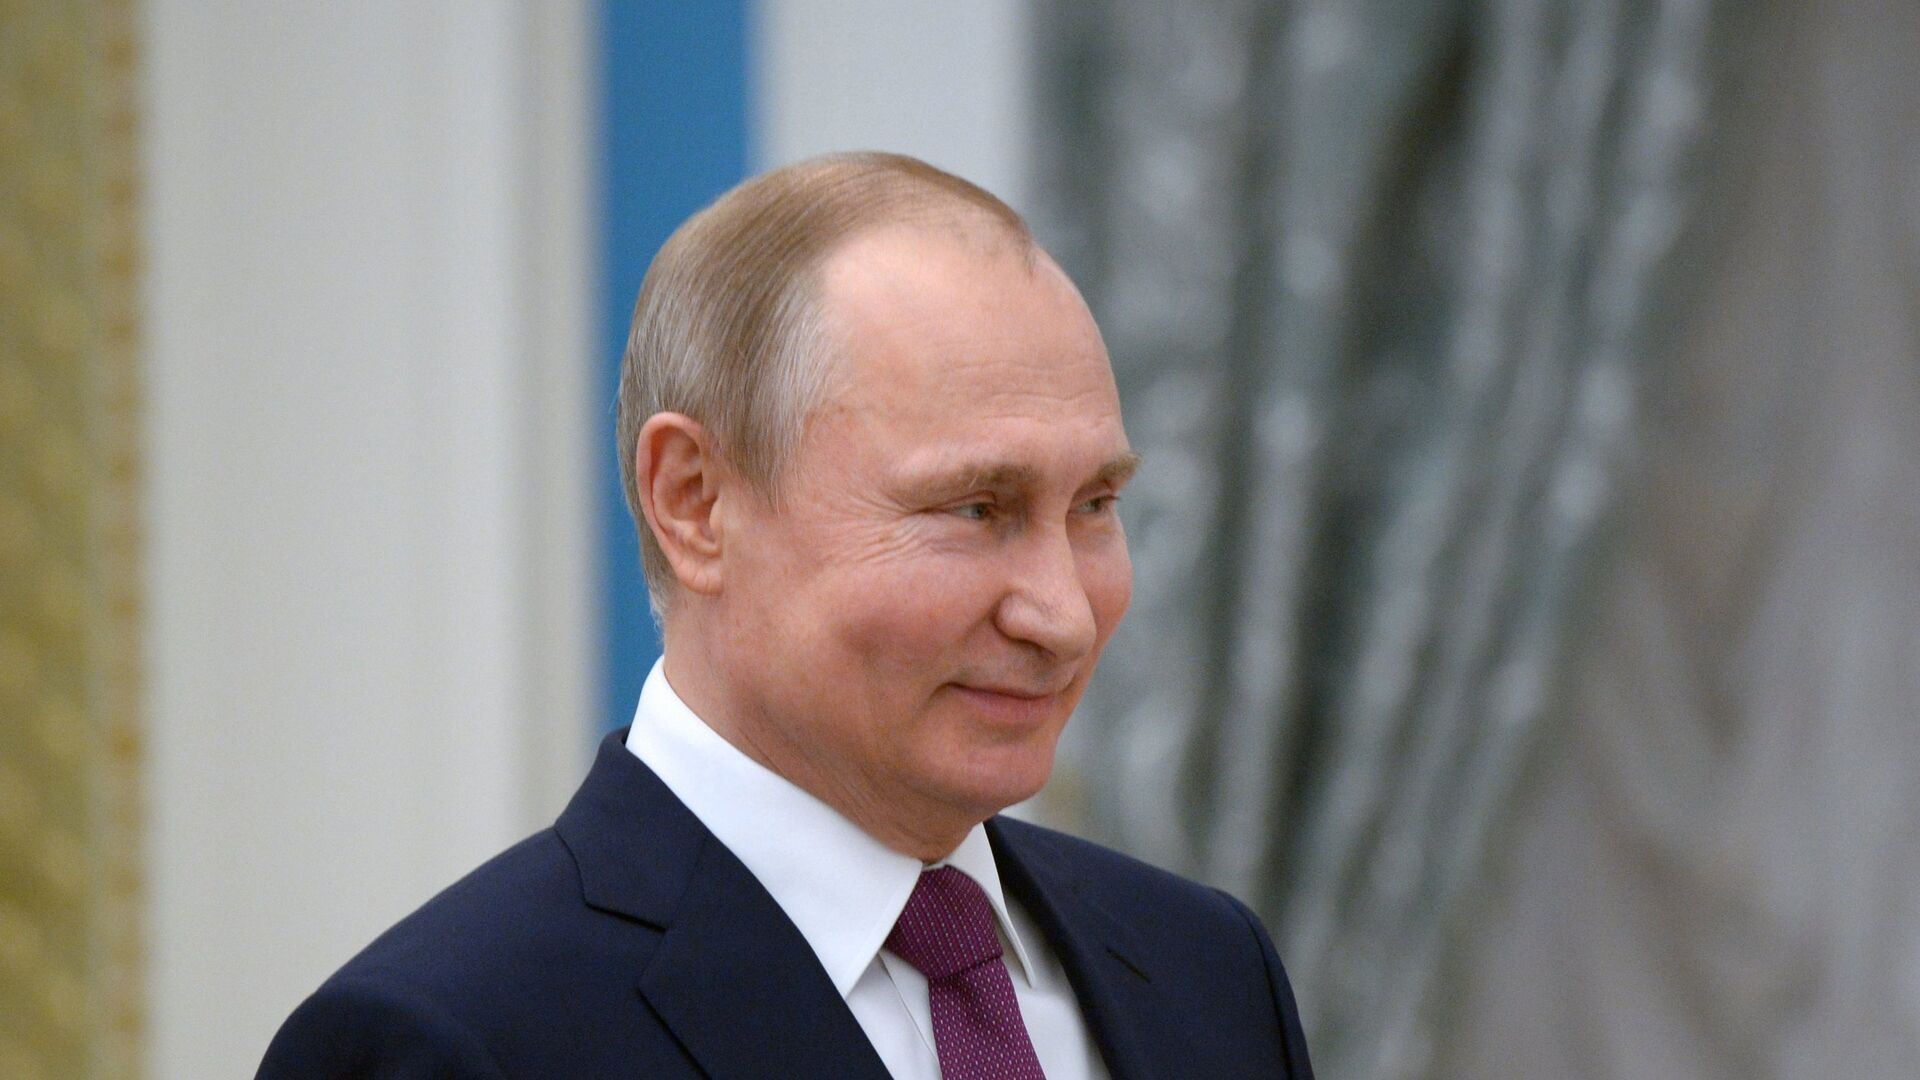 Президент РФ В. Путин, архивное фото - Sputnik Таджикистан, 1920, 13.09.2021